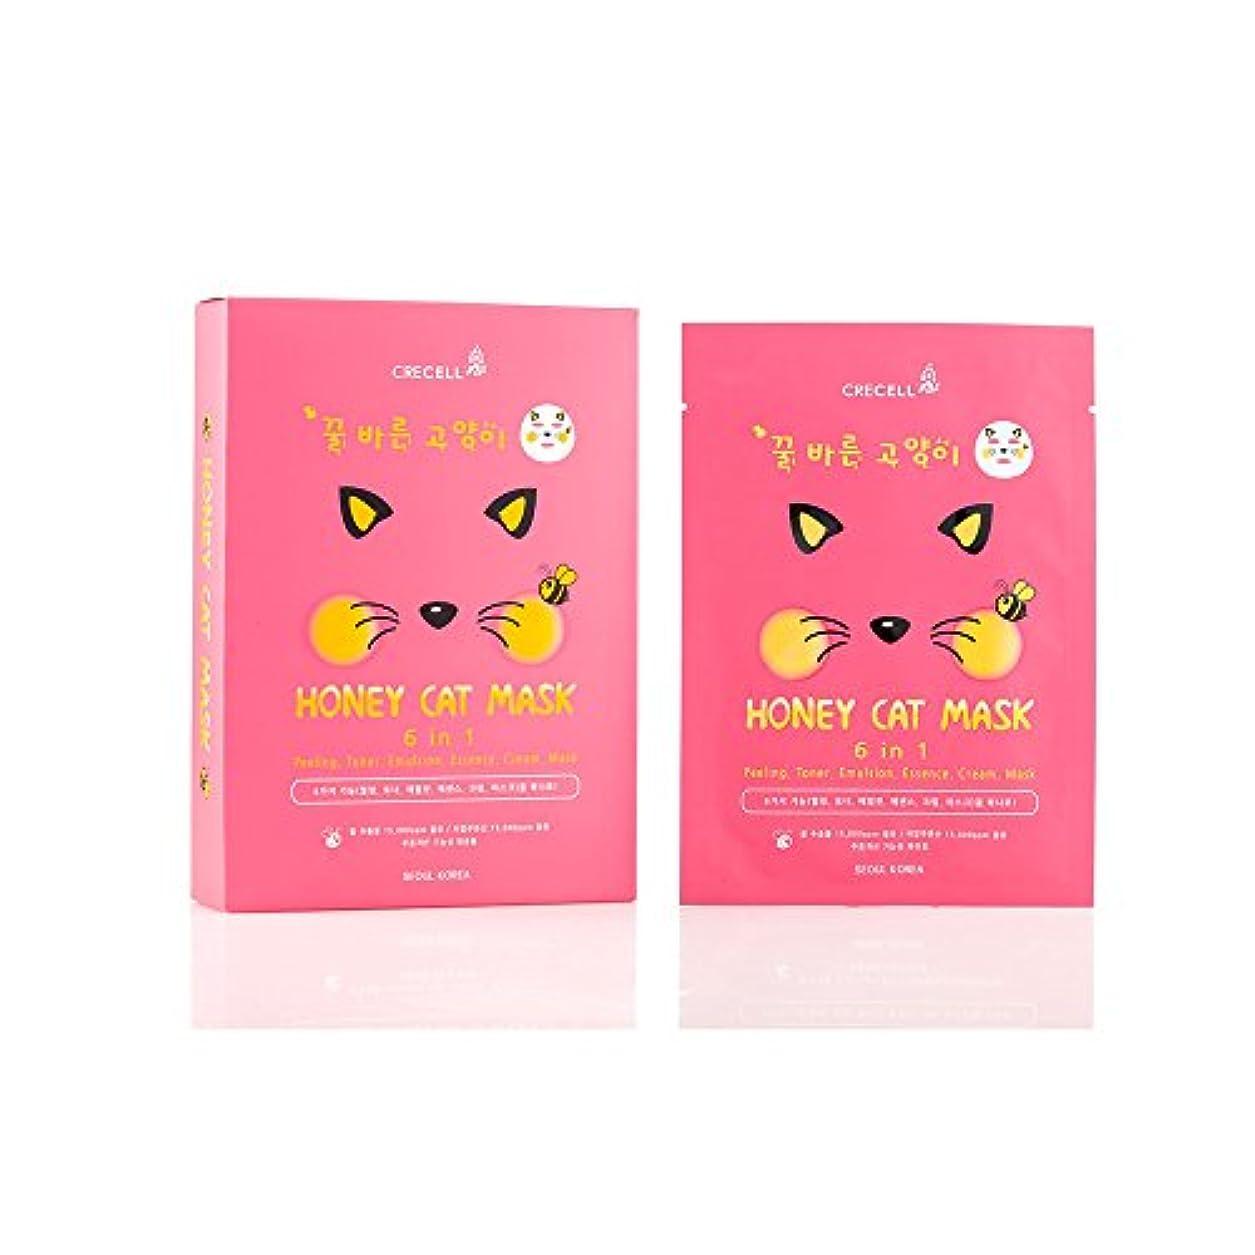 CRECELL Honey Cat Mask【クリセルハニー猫マスクシート】ネコフェイスマスクシート フェイスパック 10枚 / 25ml